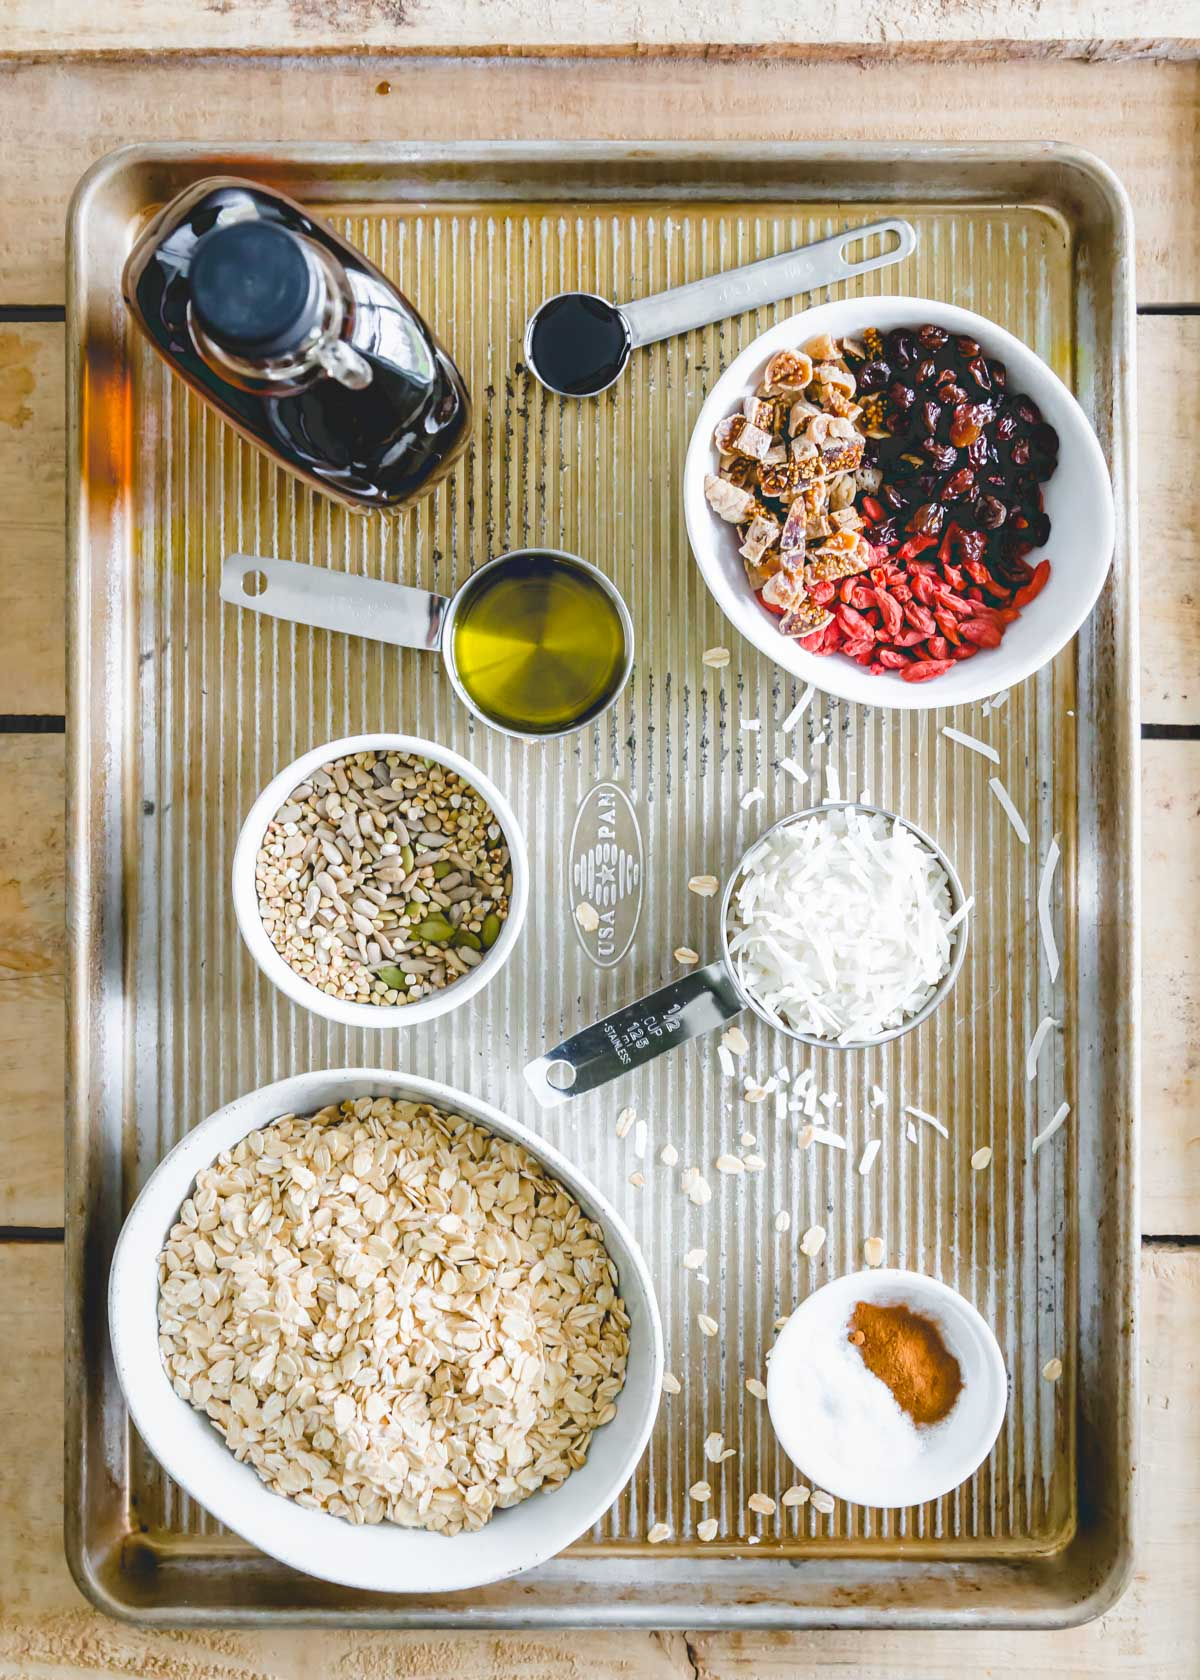 ingredients for nut free granola recipe